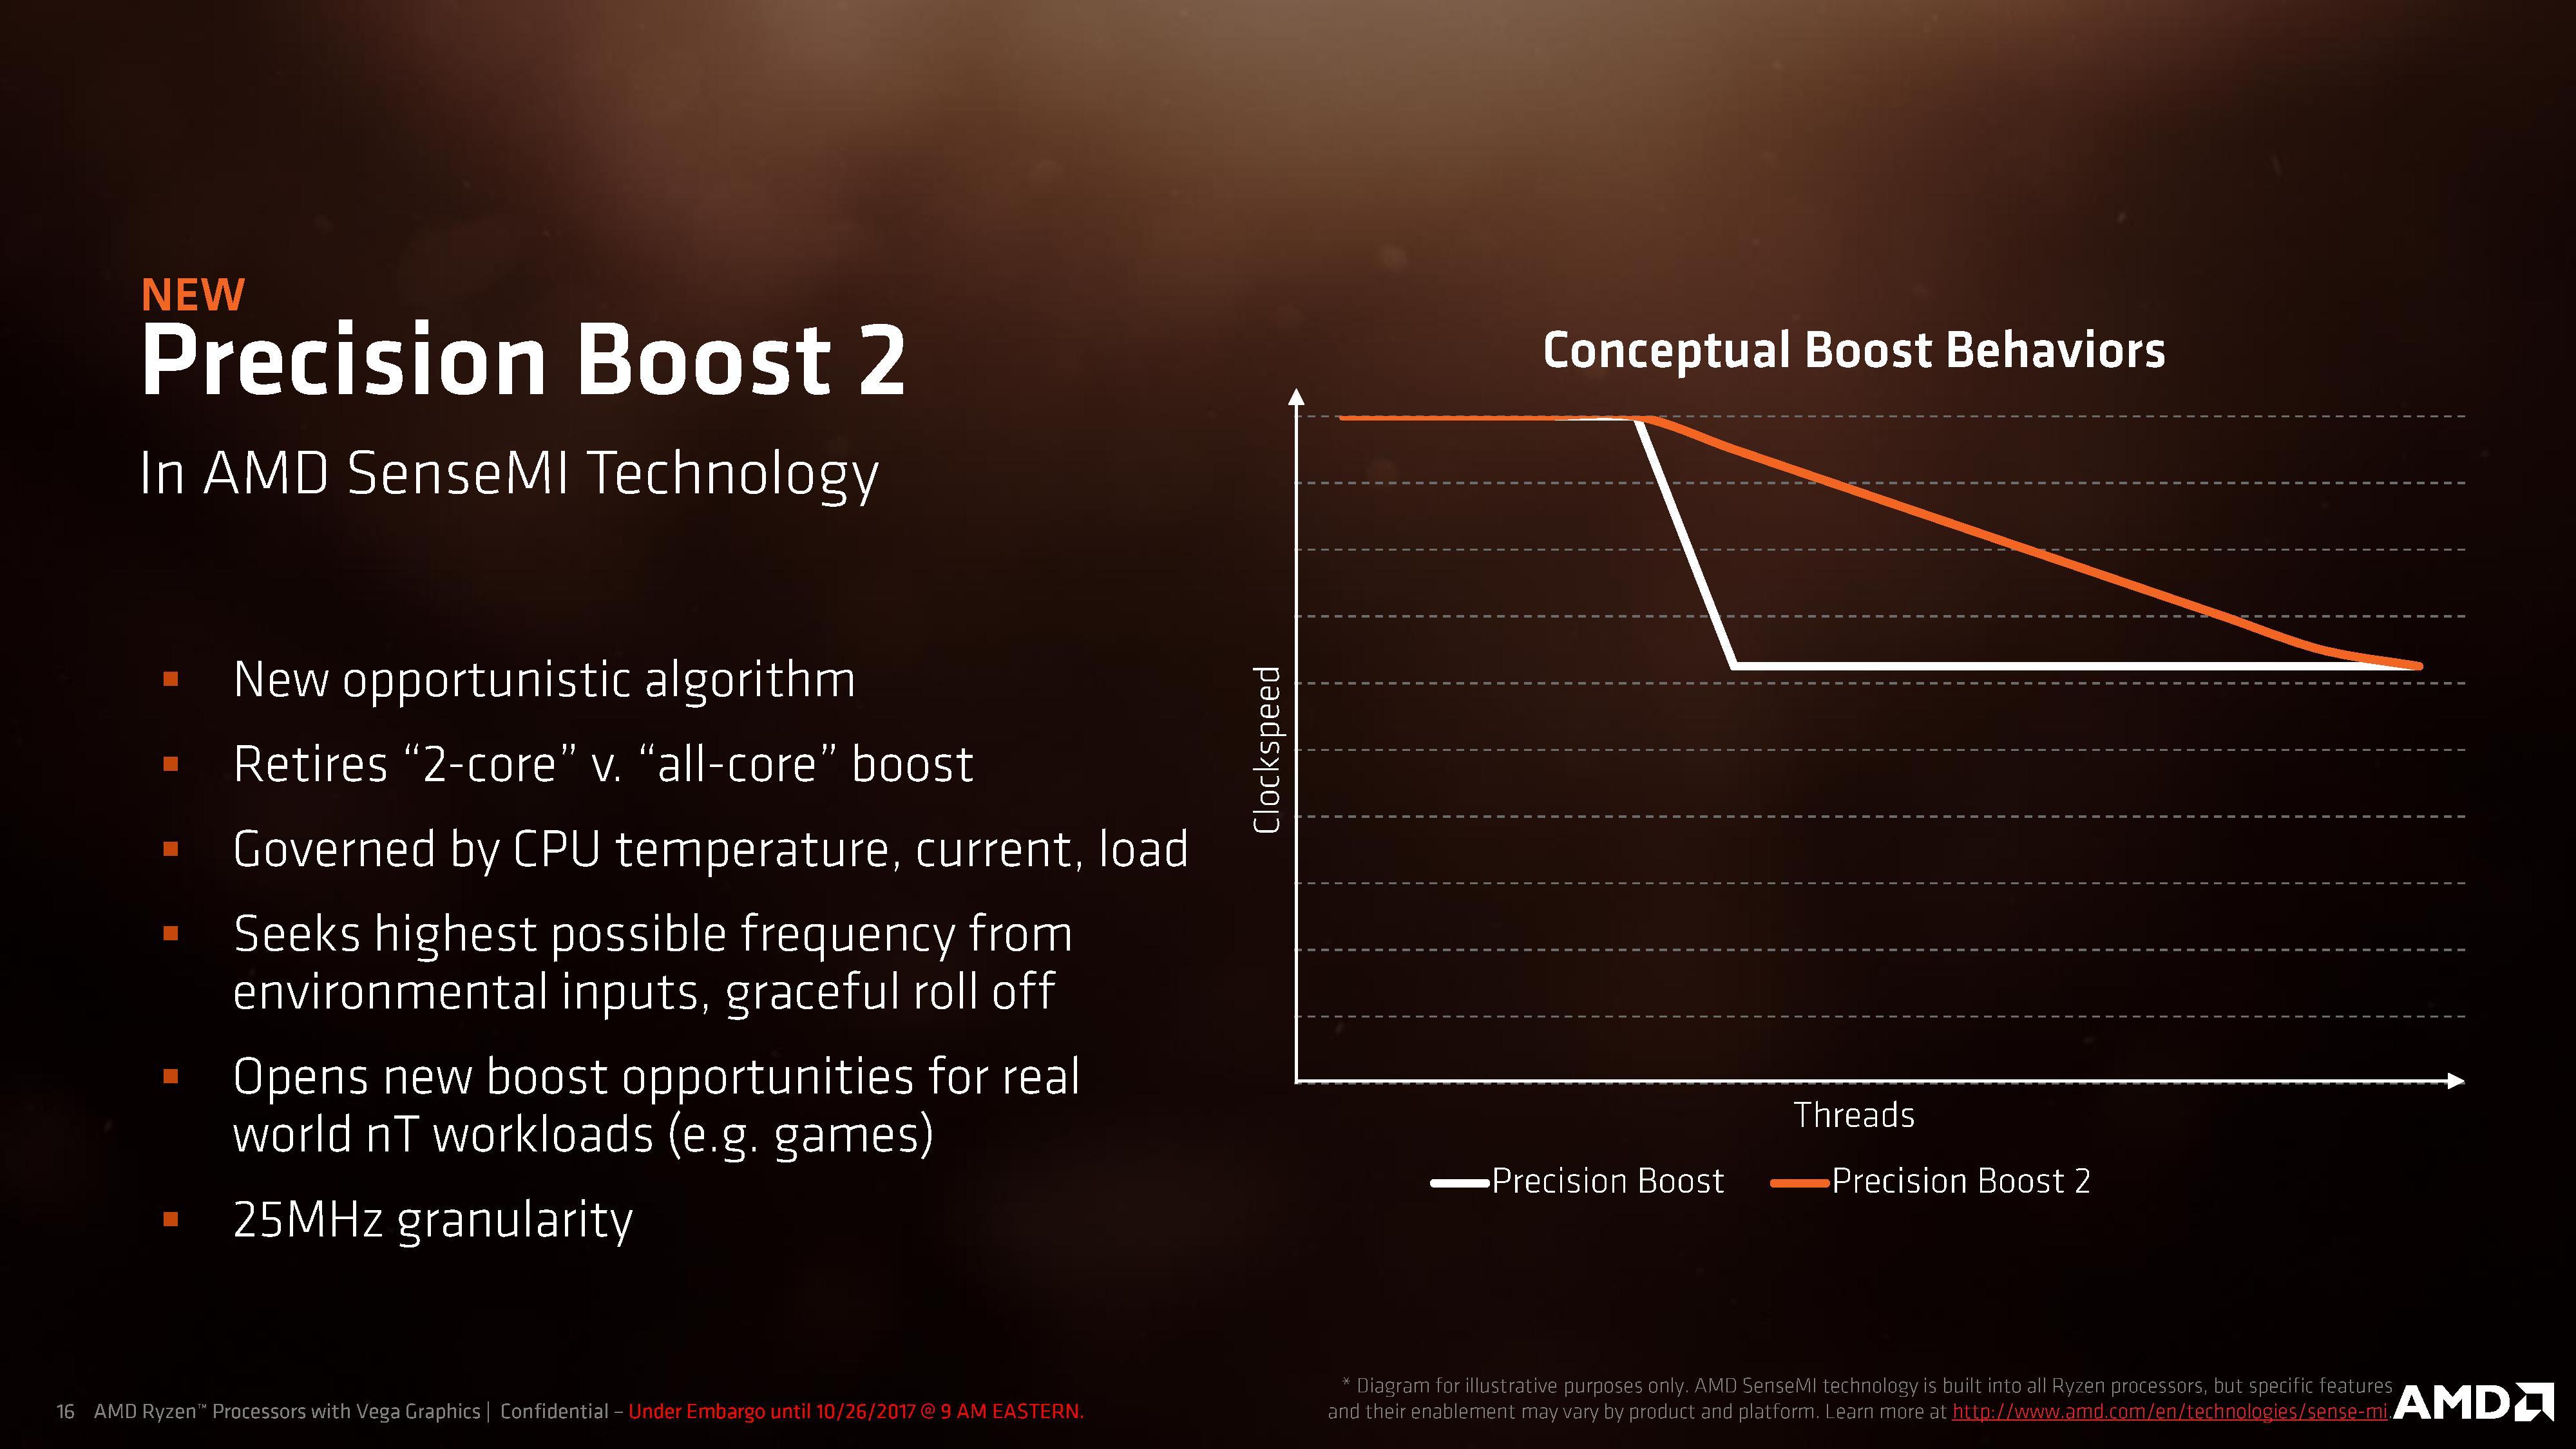 Sense Me Ryzen: Better Boost - Ryzen Mobile is Launched: AMD